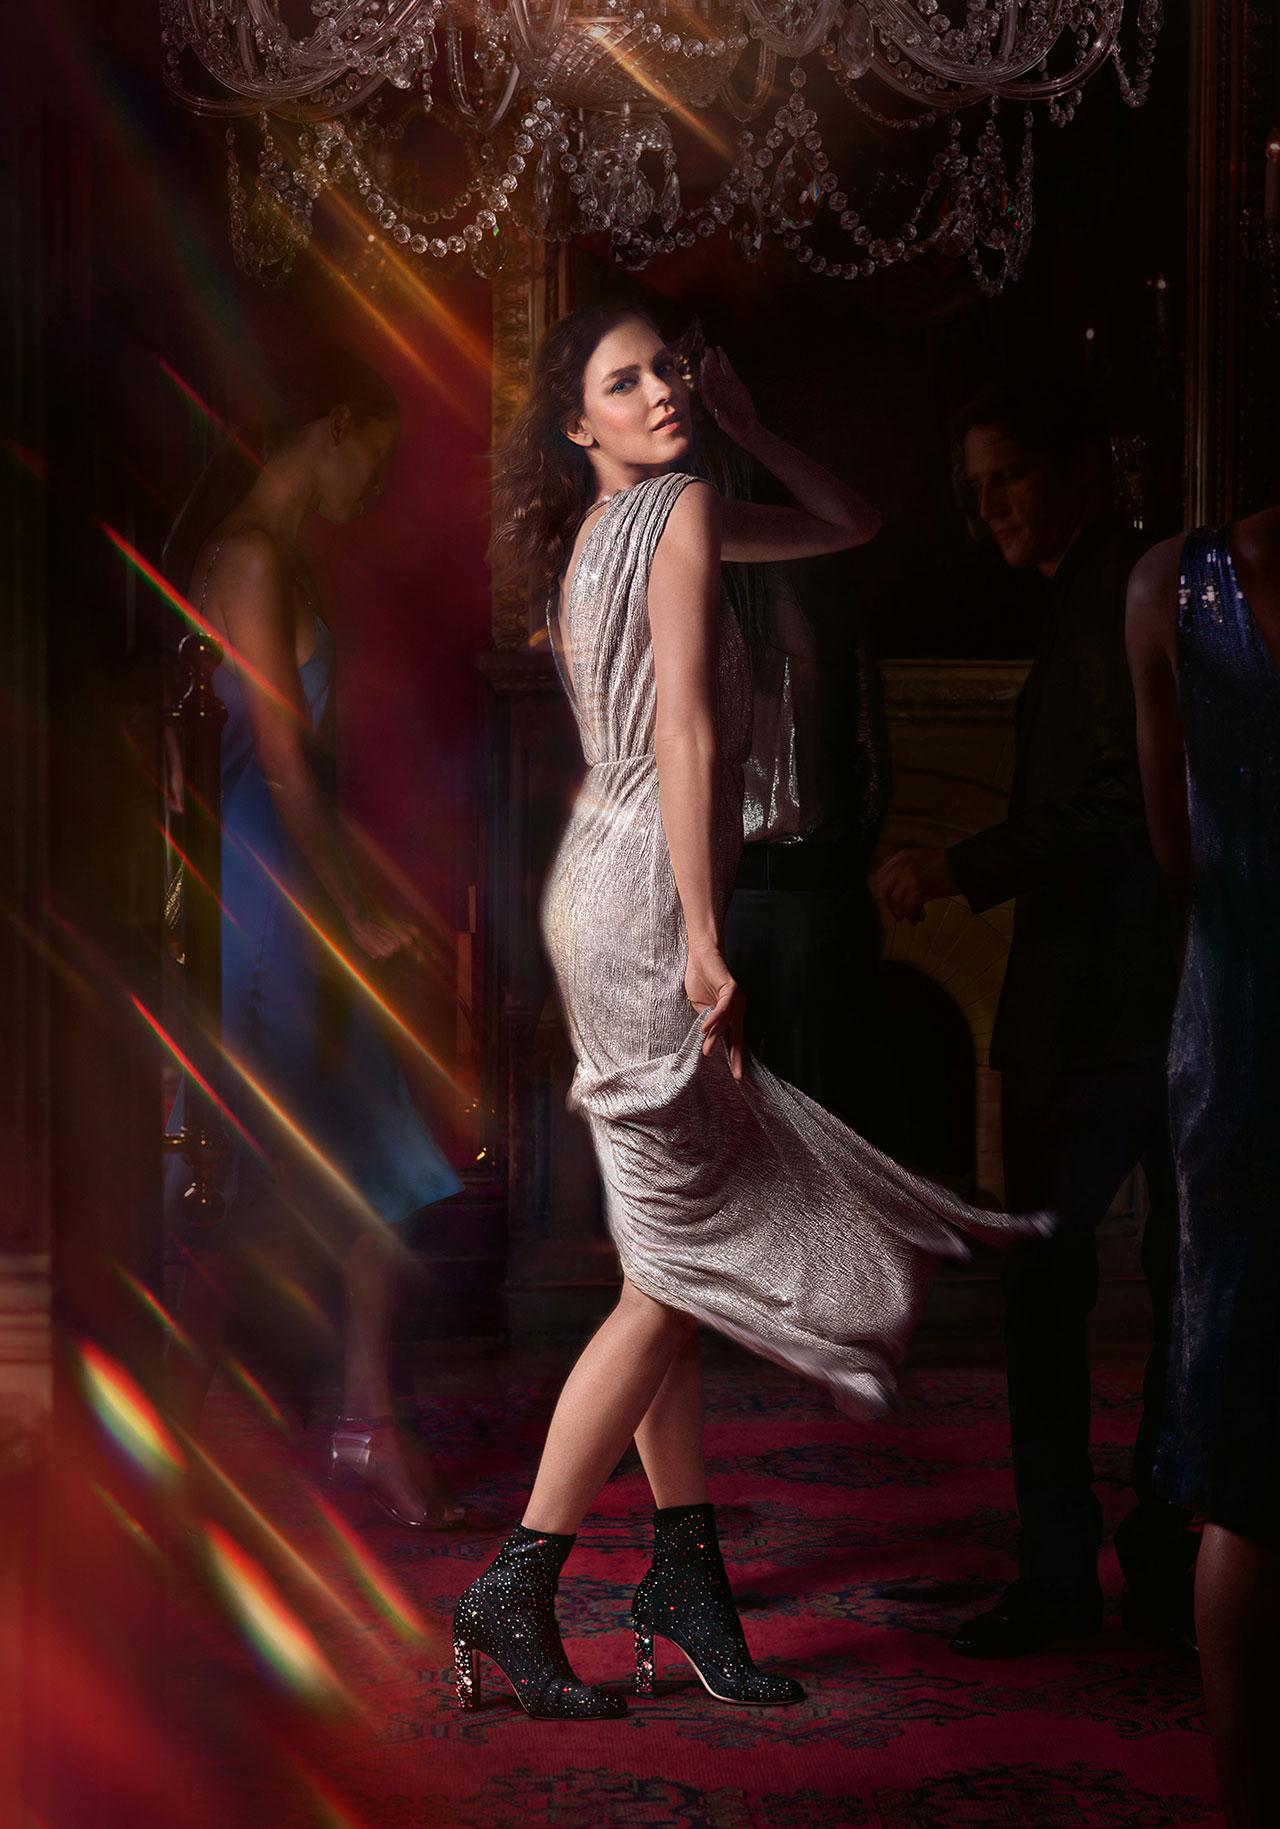 Shot by Serge Leblon, the campaign stars models Kati Nescher and Roch Babot. | ©︎ Jimmy Choo